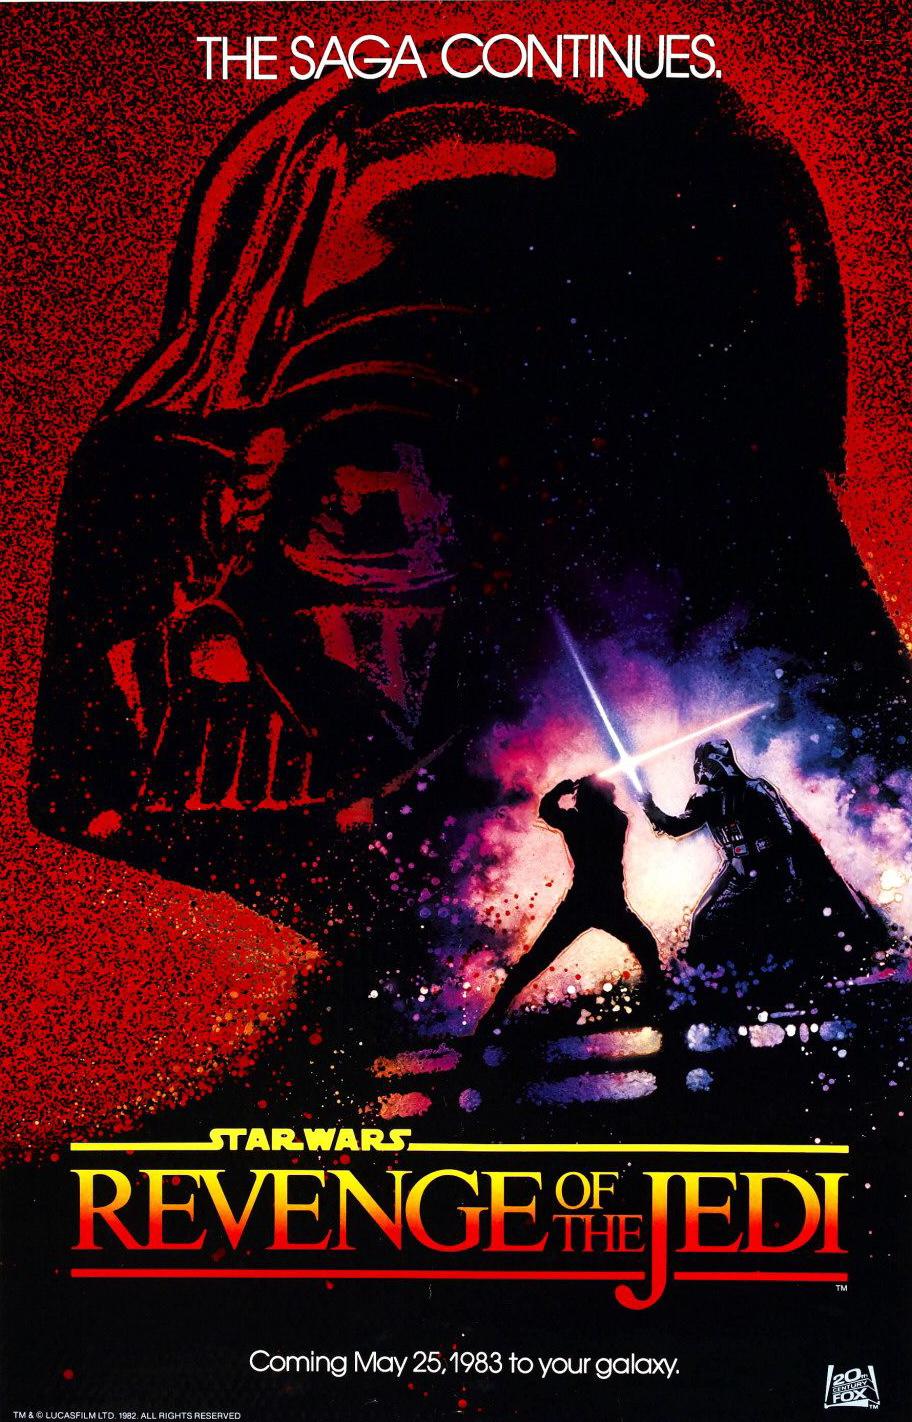 Star Wars Episode VI: Return of the Jedi   Star Wars